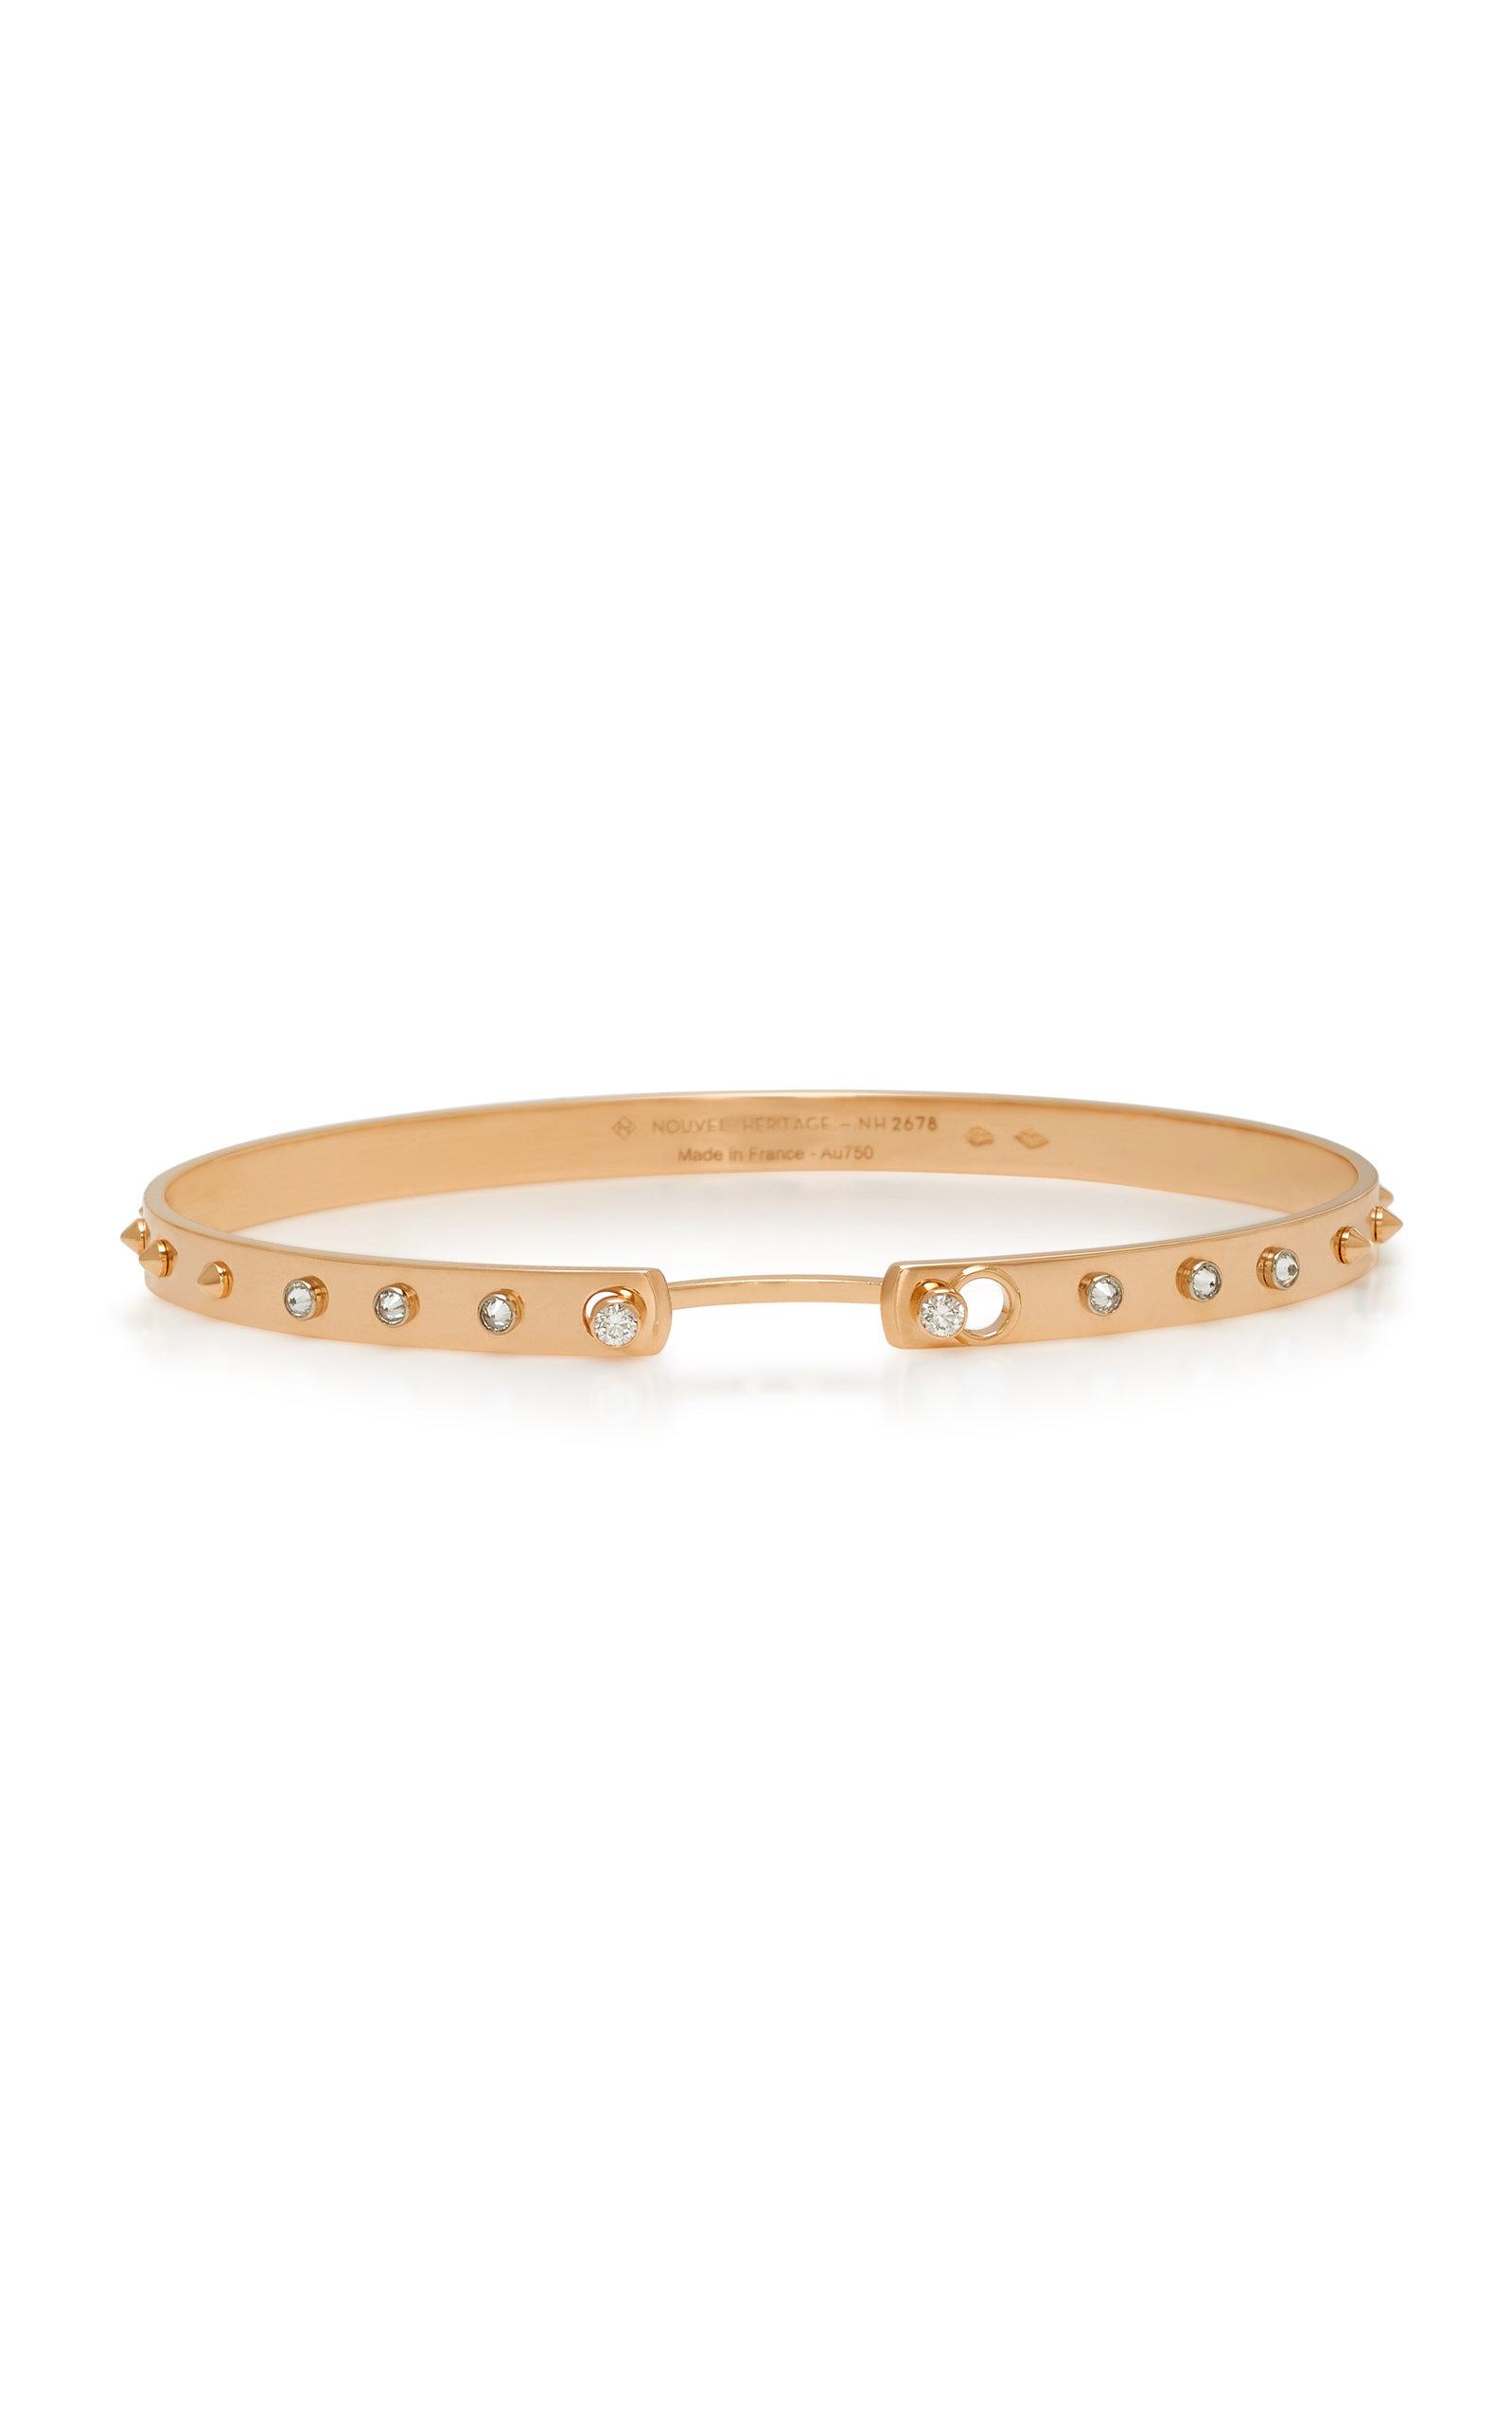 NOUVEL HERITAGE Brunch In Ny 18K Rose Gold Diamond Bangle